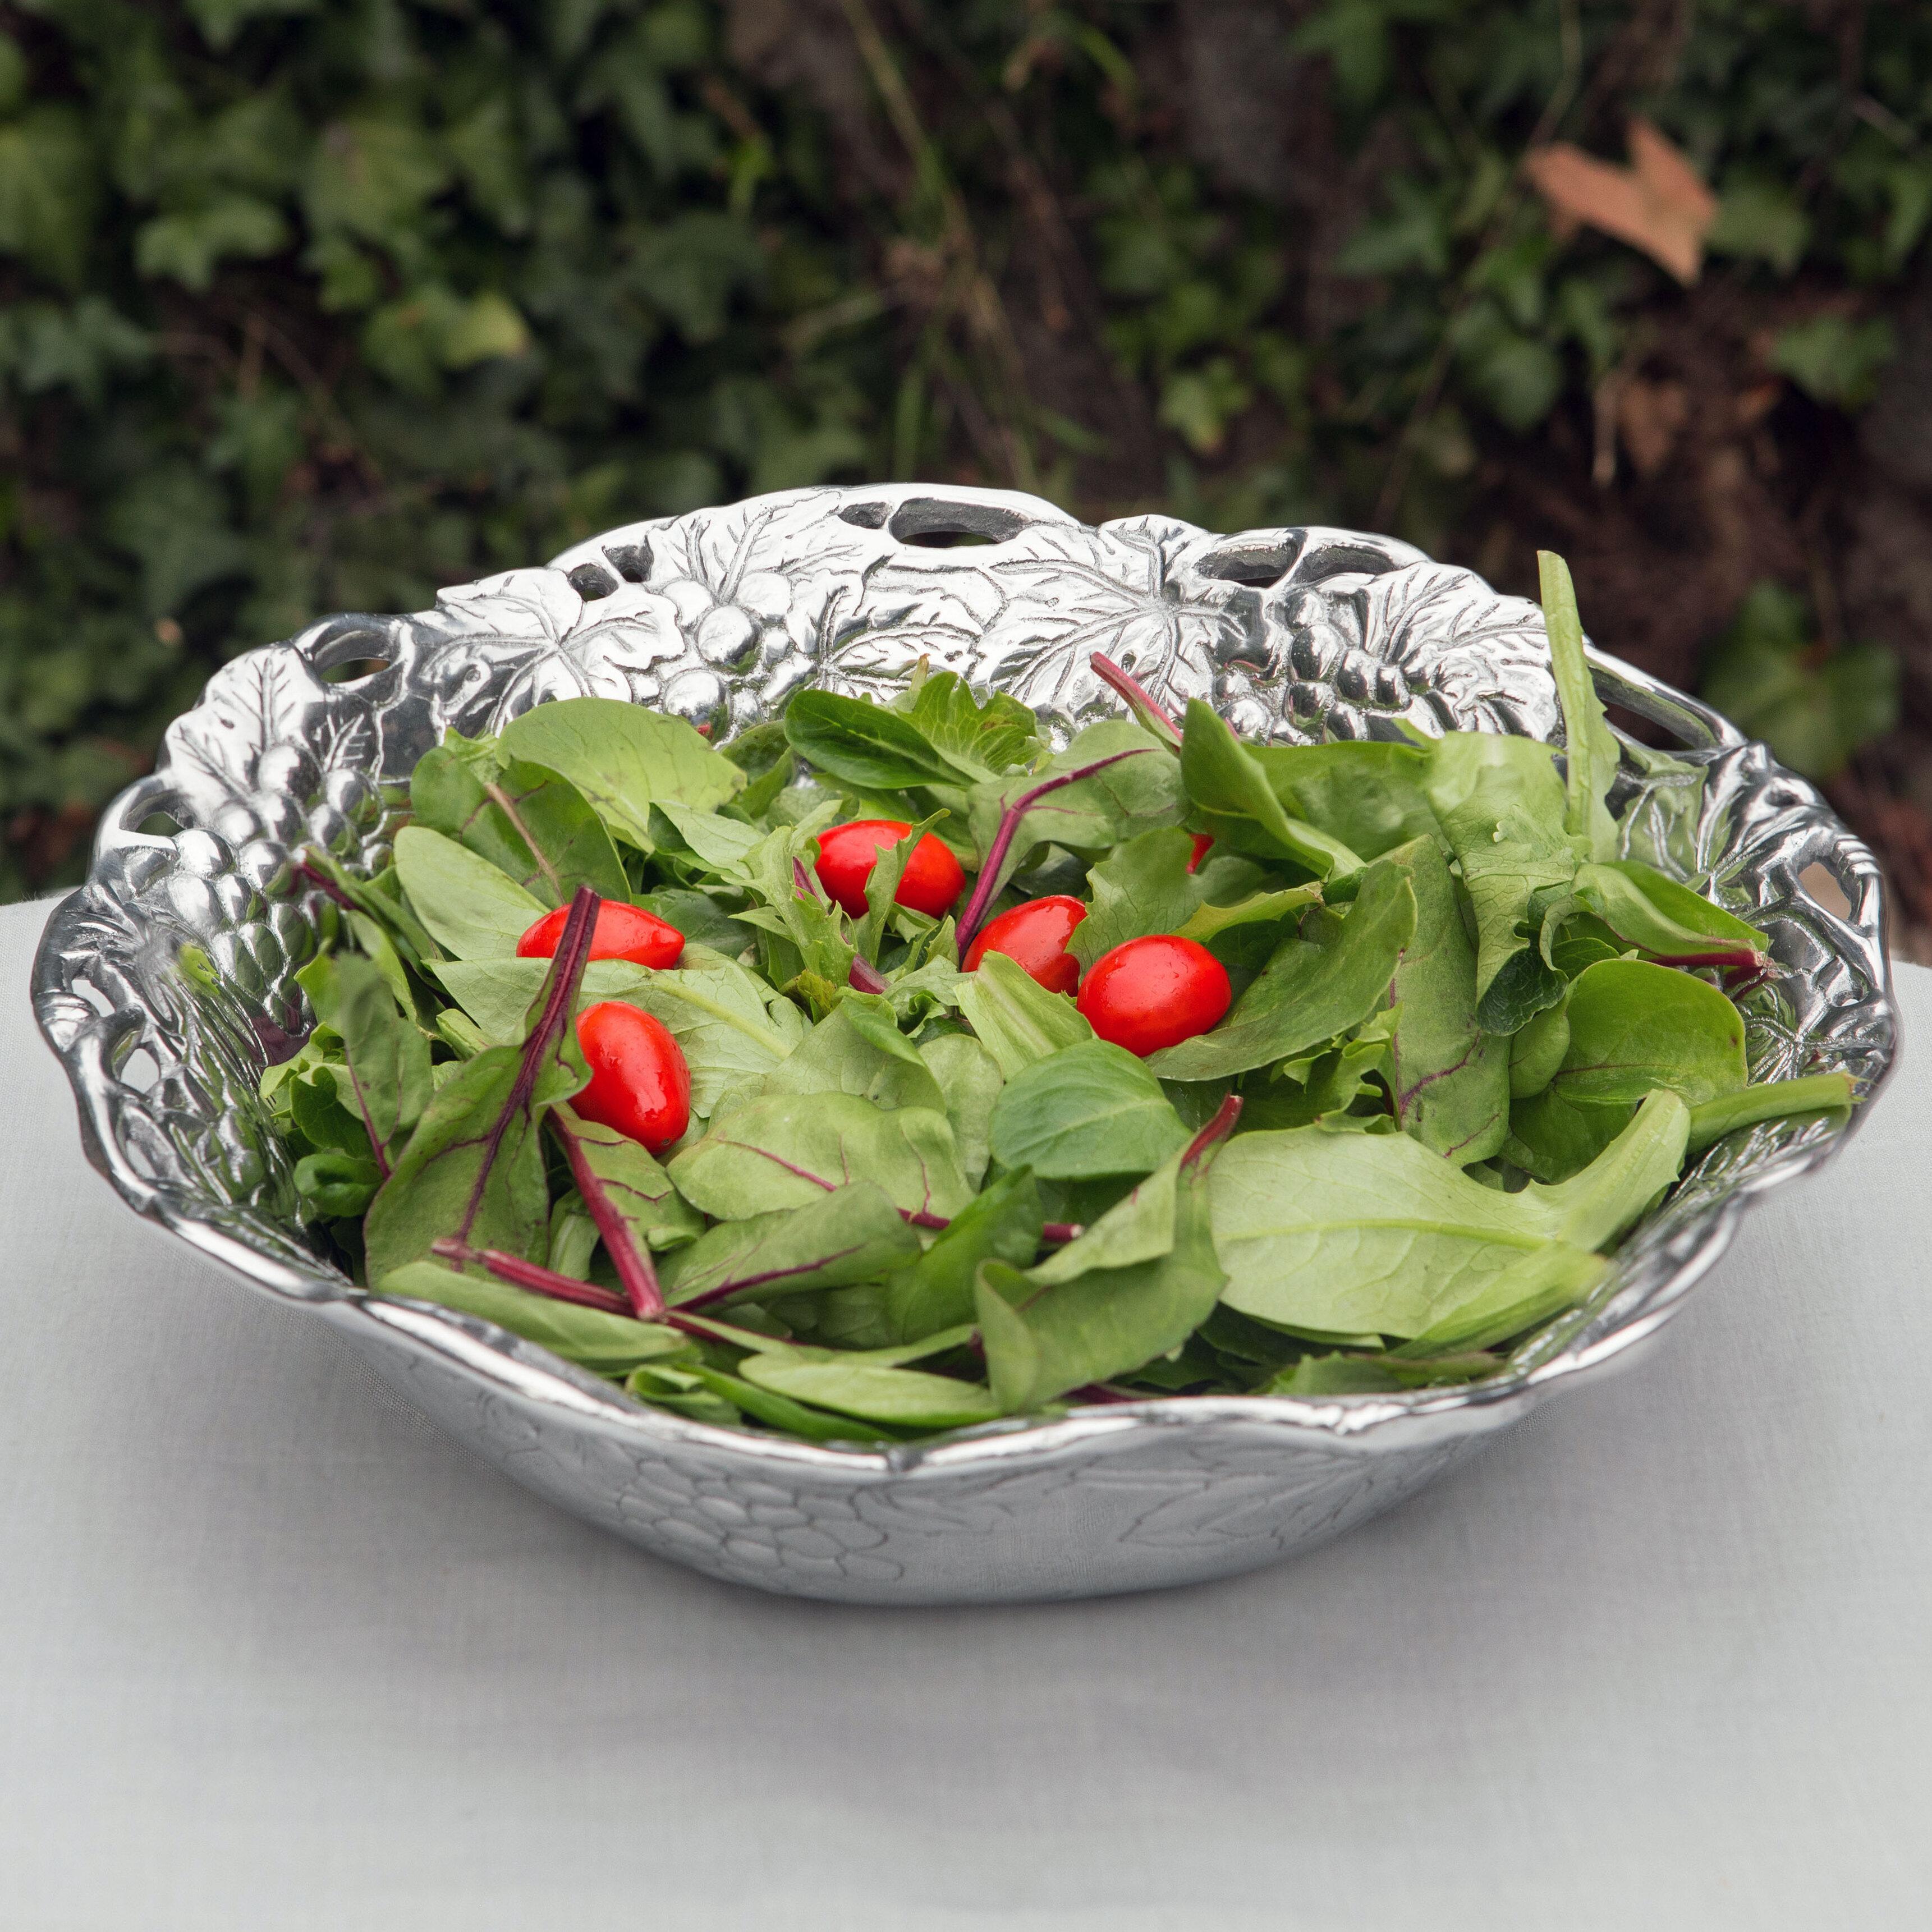 Fruit Bowl Ceramic Salad Grape Design Kitchenware Tuscan Style Decor Pedestal Decorative Plates Bowls